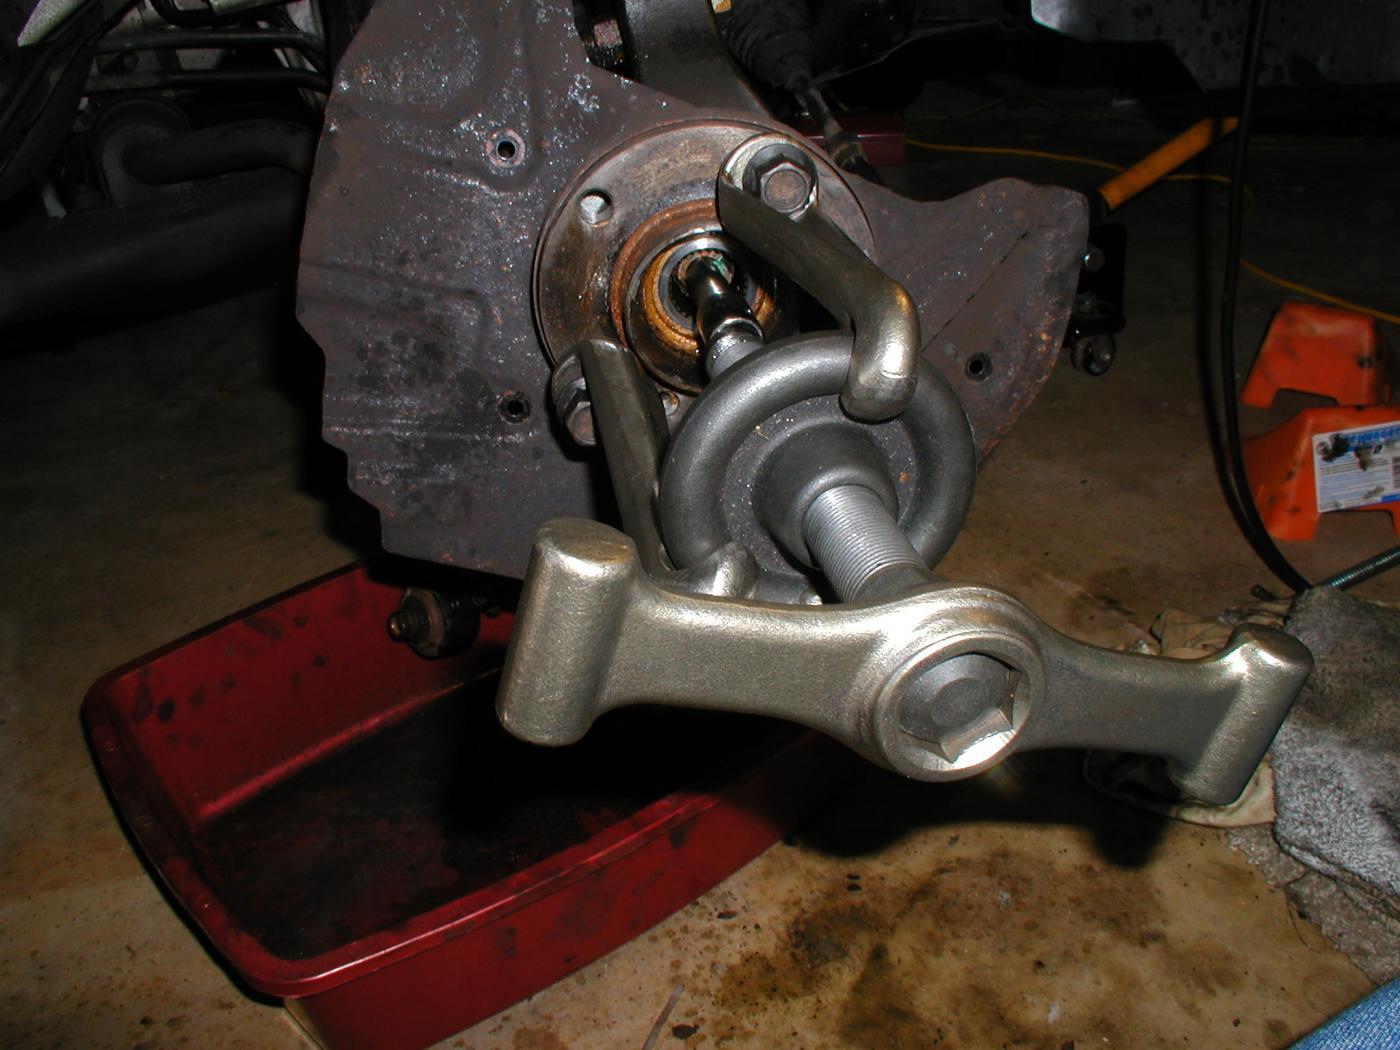 X5 DIY CV Joint Boot Replacement - Xoutpost com